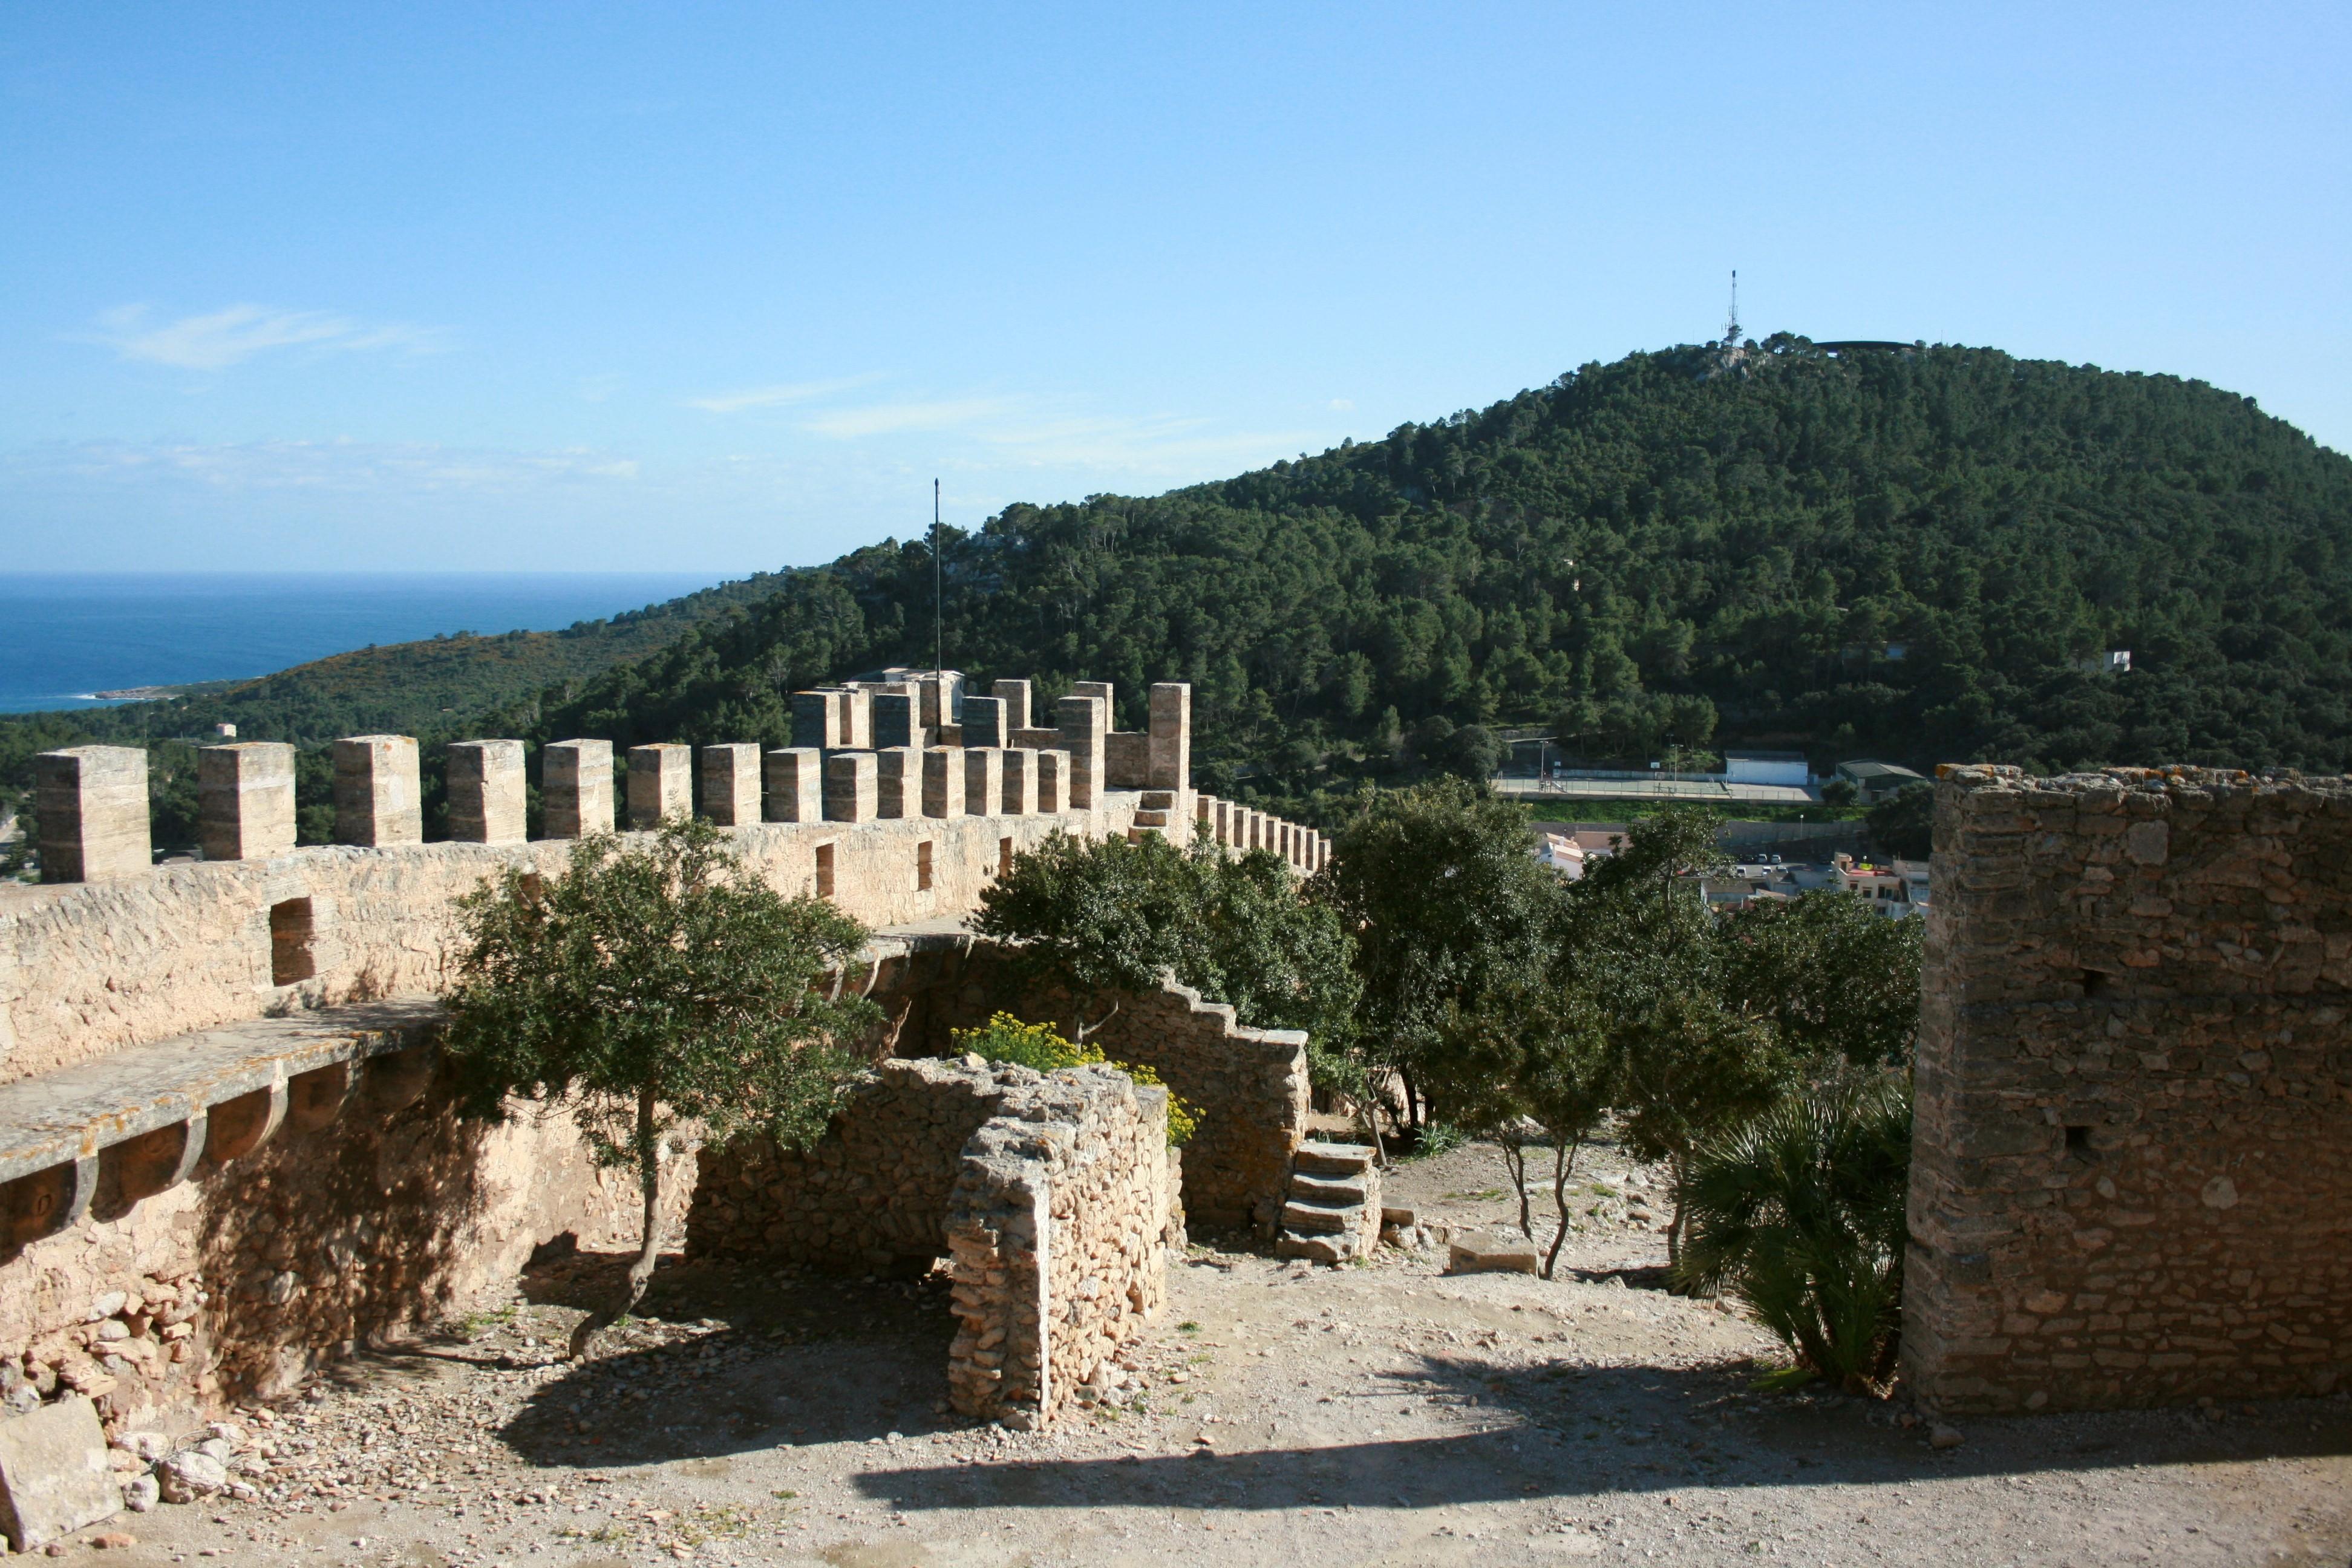 File:Capdepera - Castell de Capdepera 08 ies.jpg - Wikimedia Commons